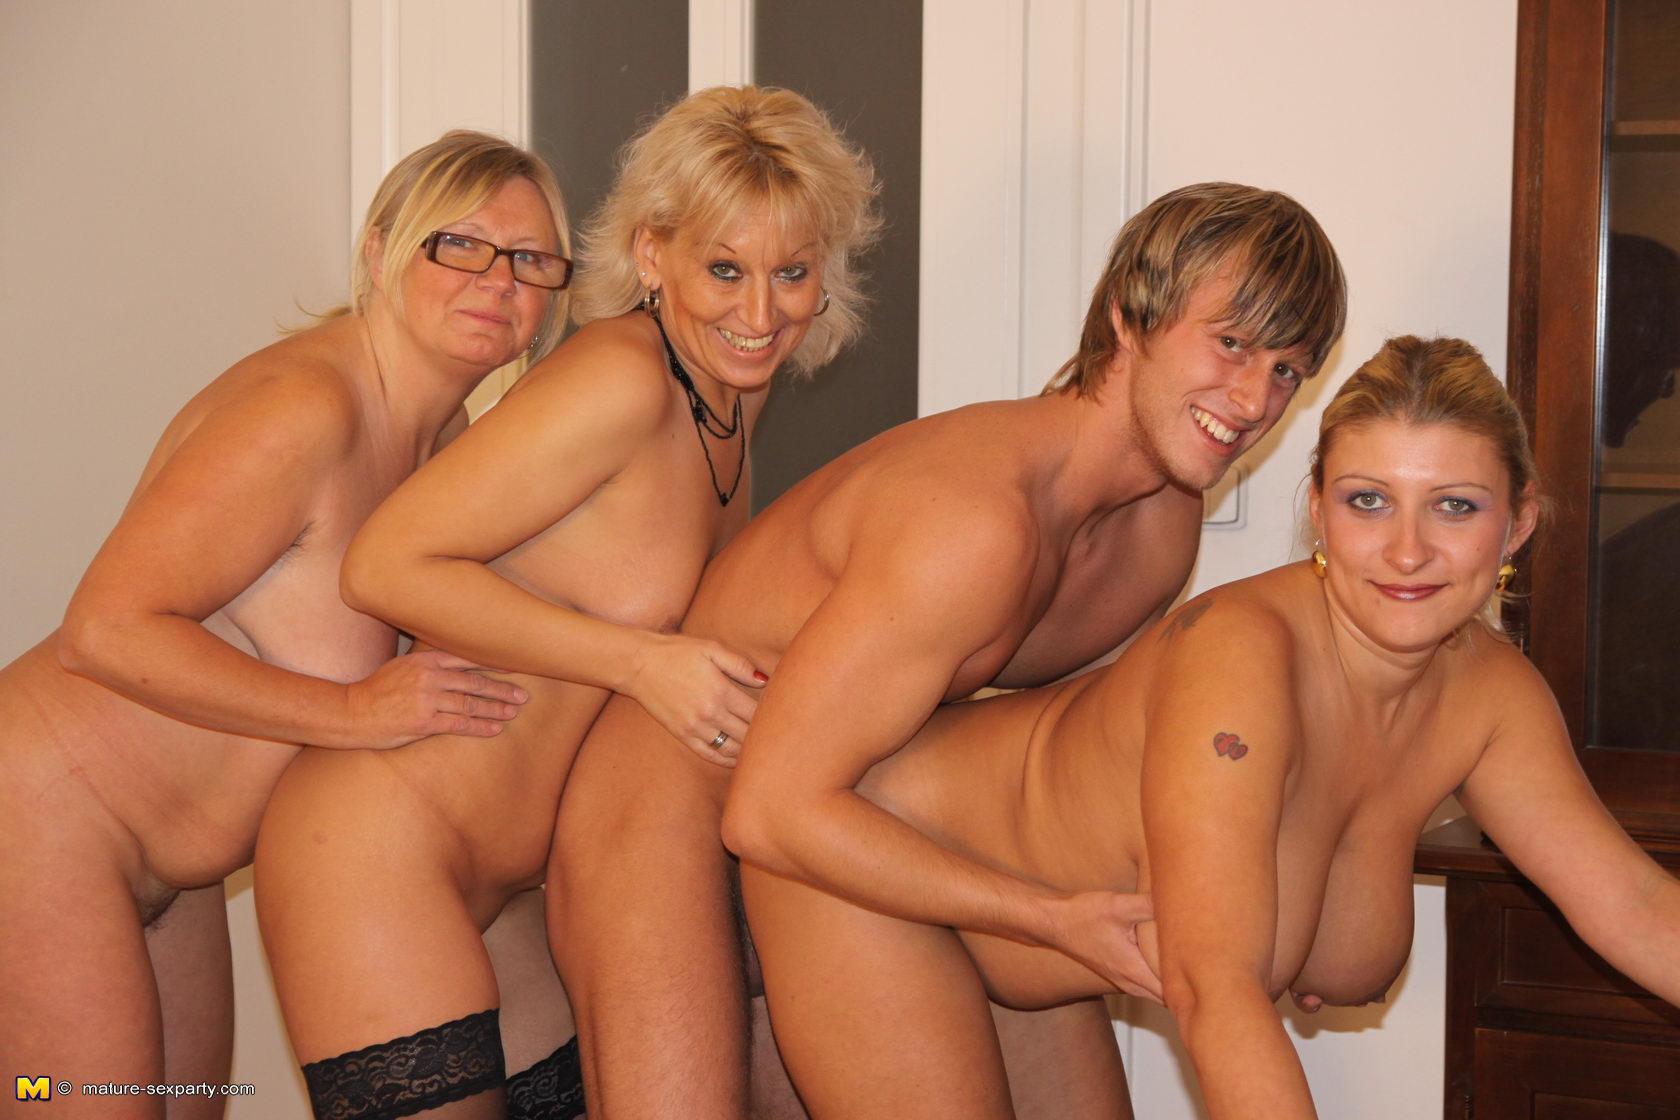 Три мамочки и один мужик 5 фотография